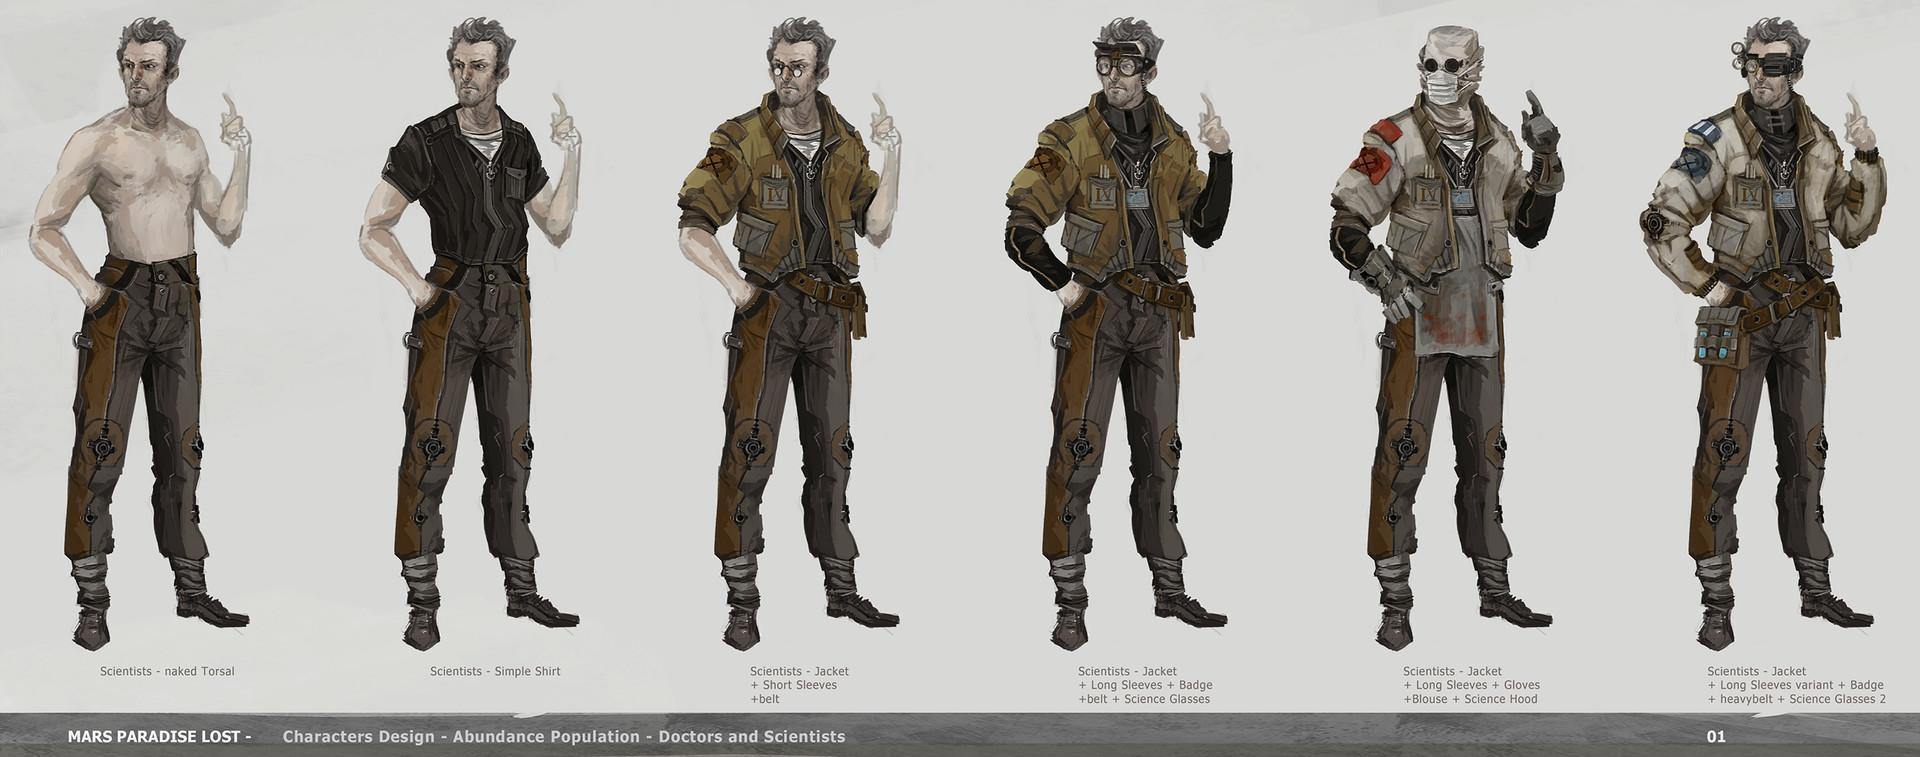 Alexandre chaudret mpl characters abondance population scientists01